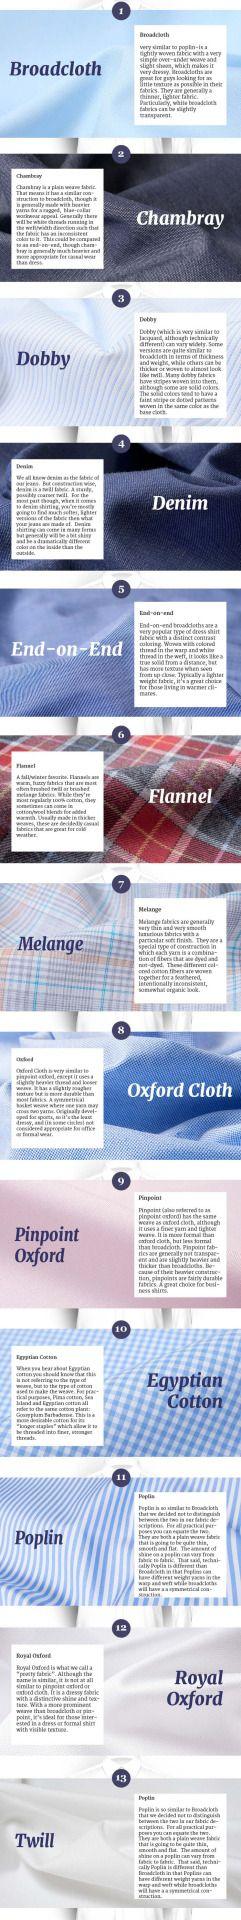 A visual glossary of dress shirt fabrics Via